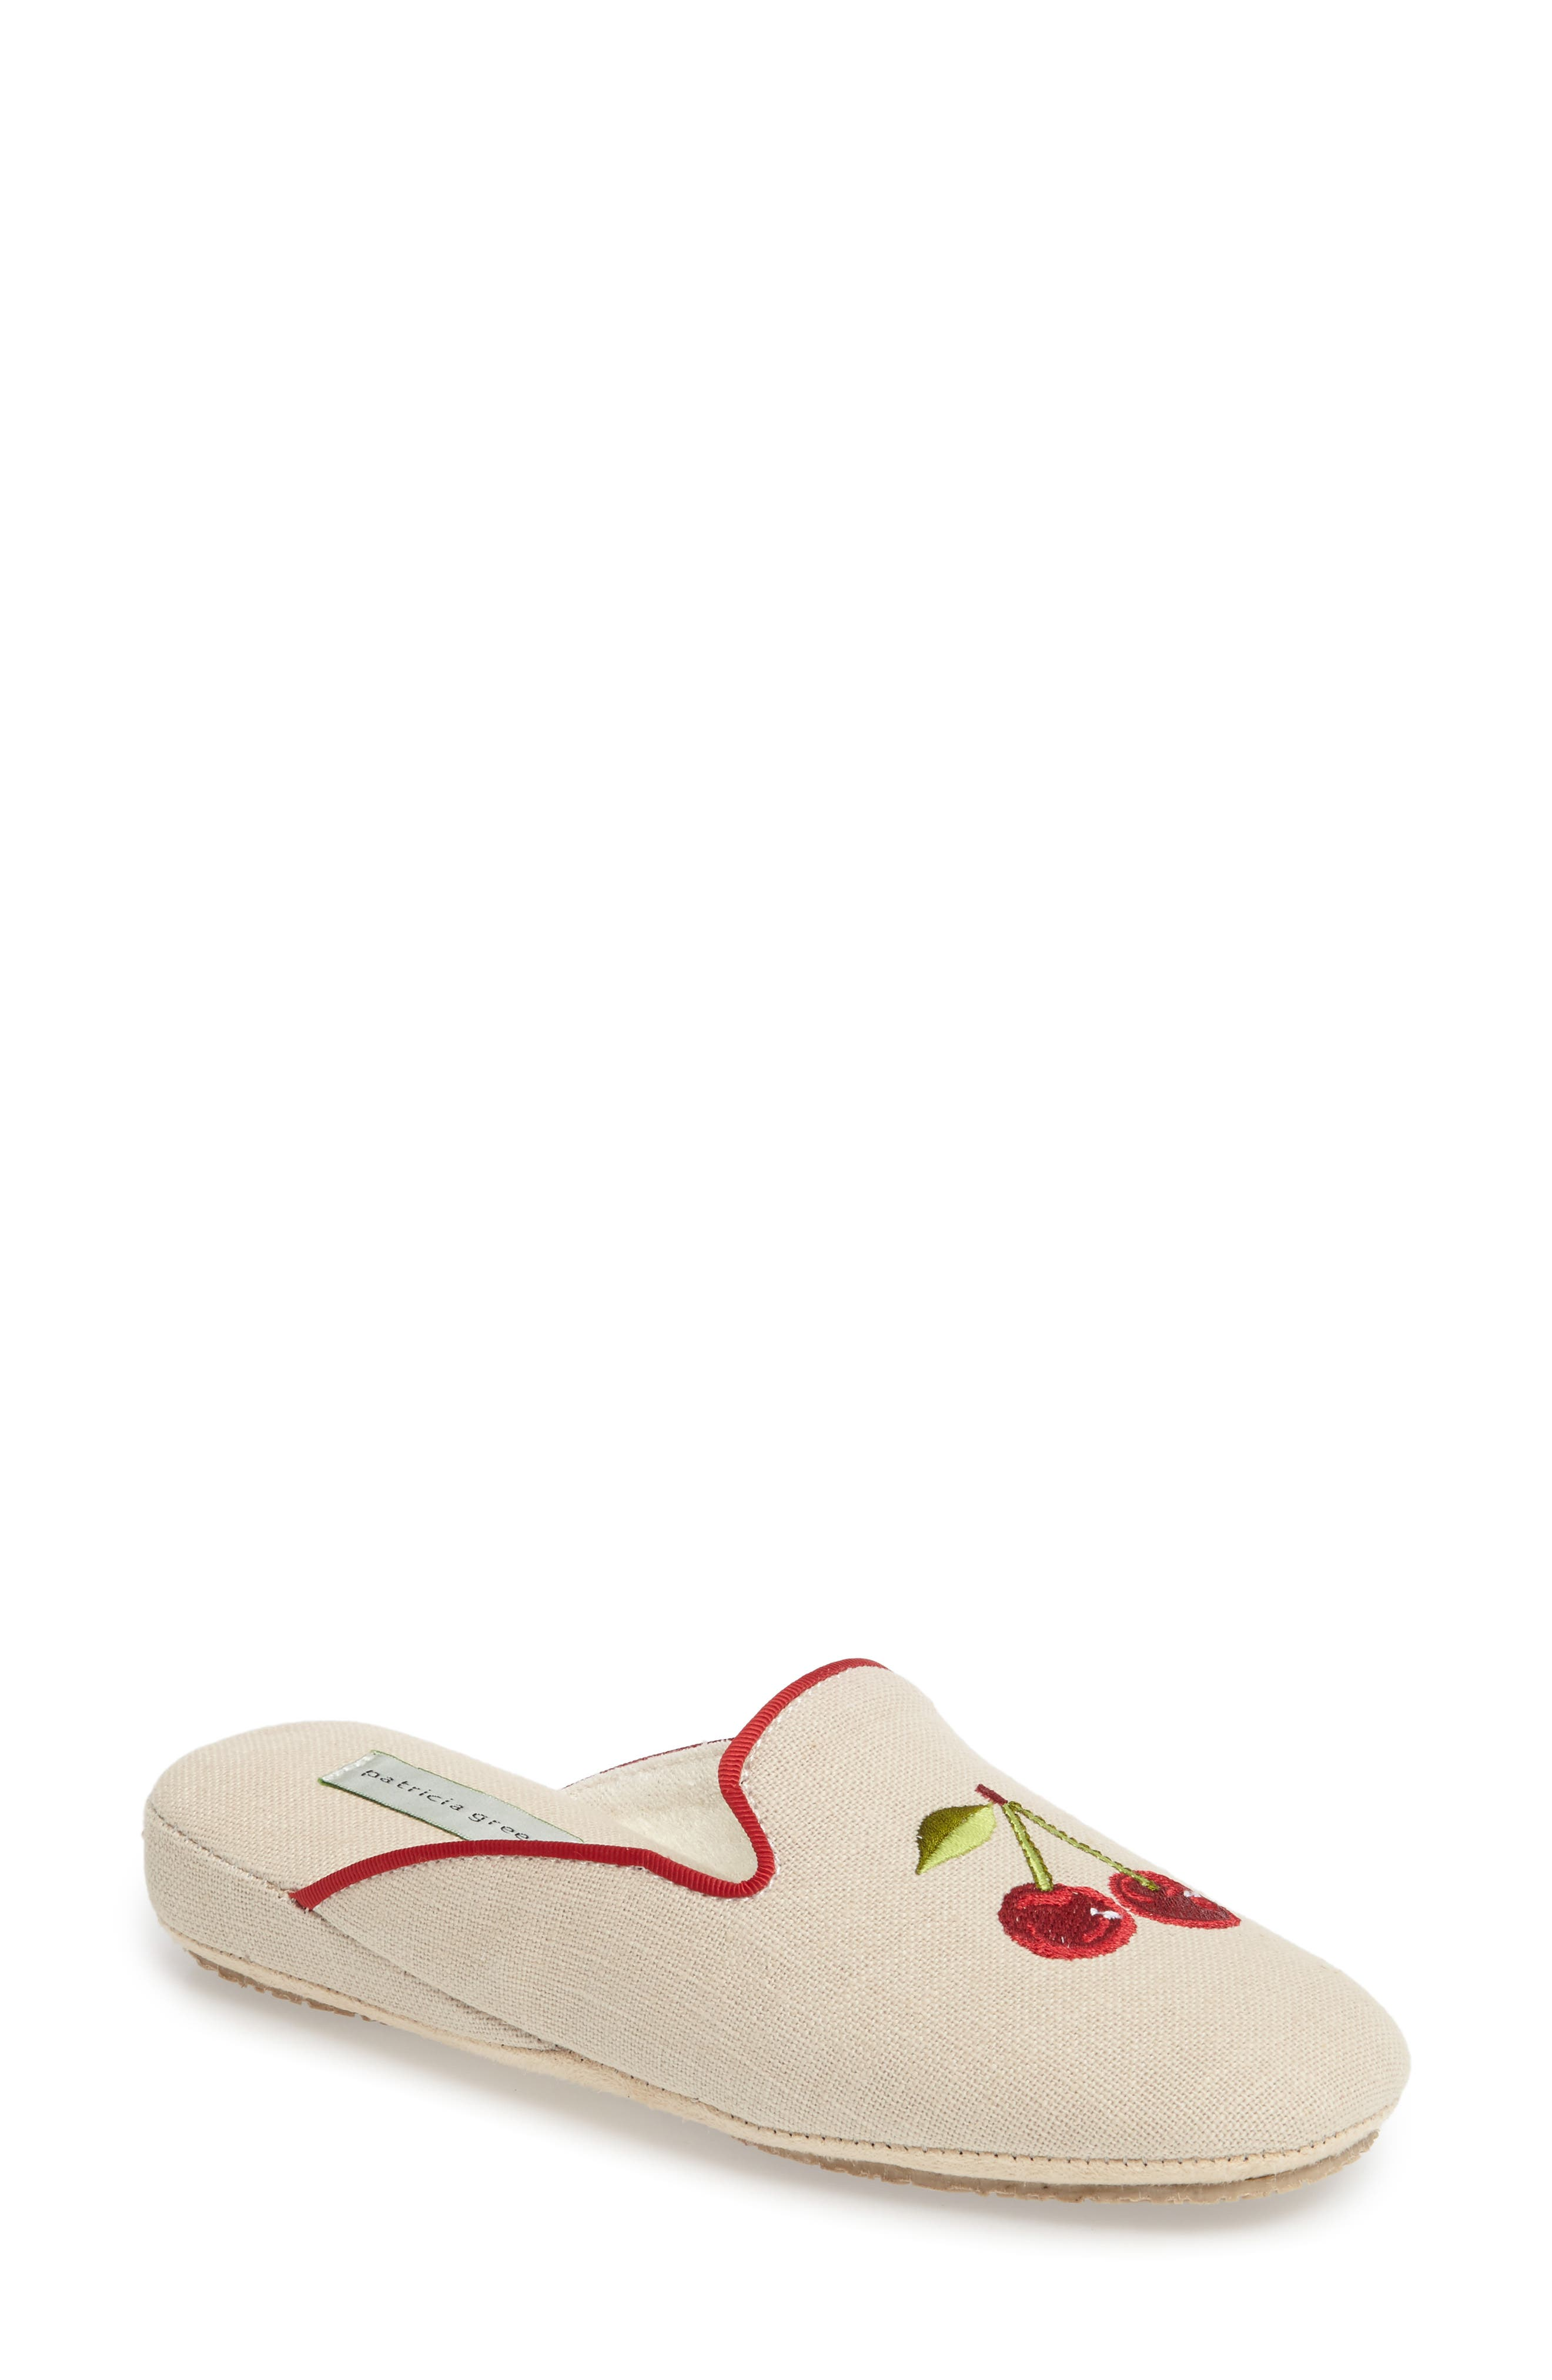 Cherries Slipper,                             Main thumbnail 1, color,                             252